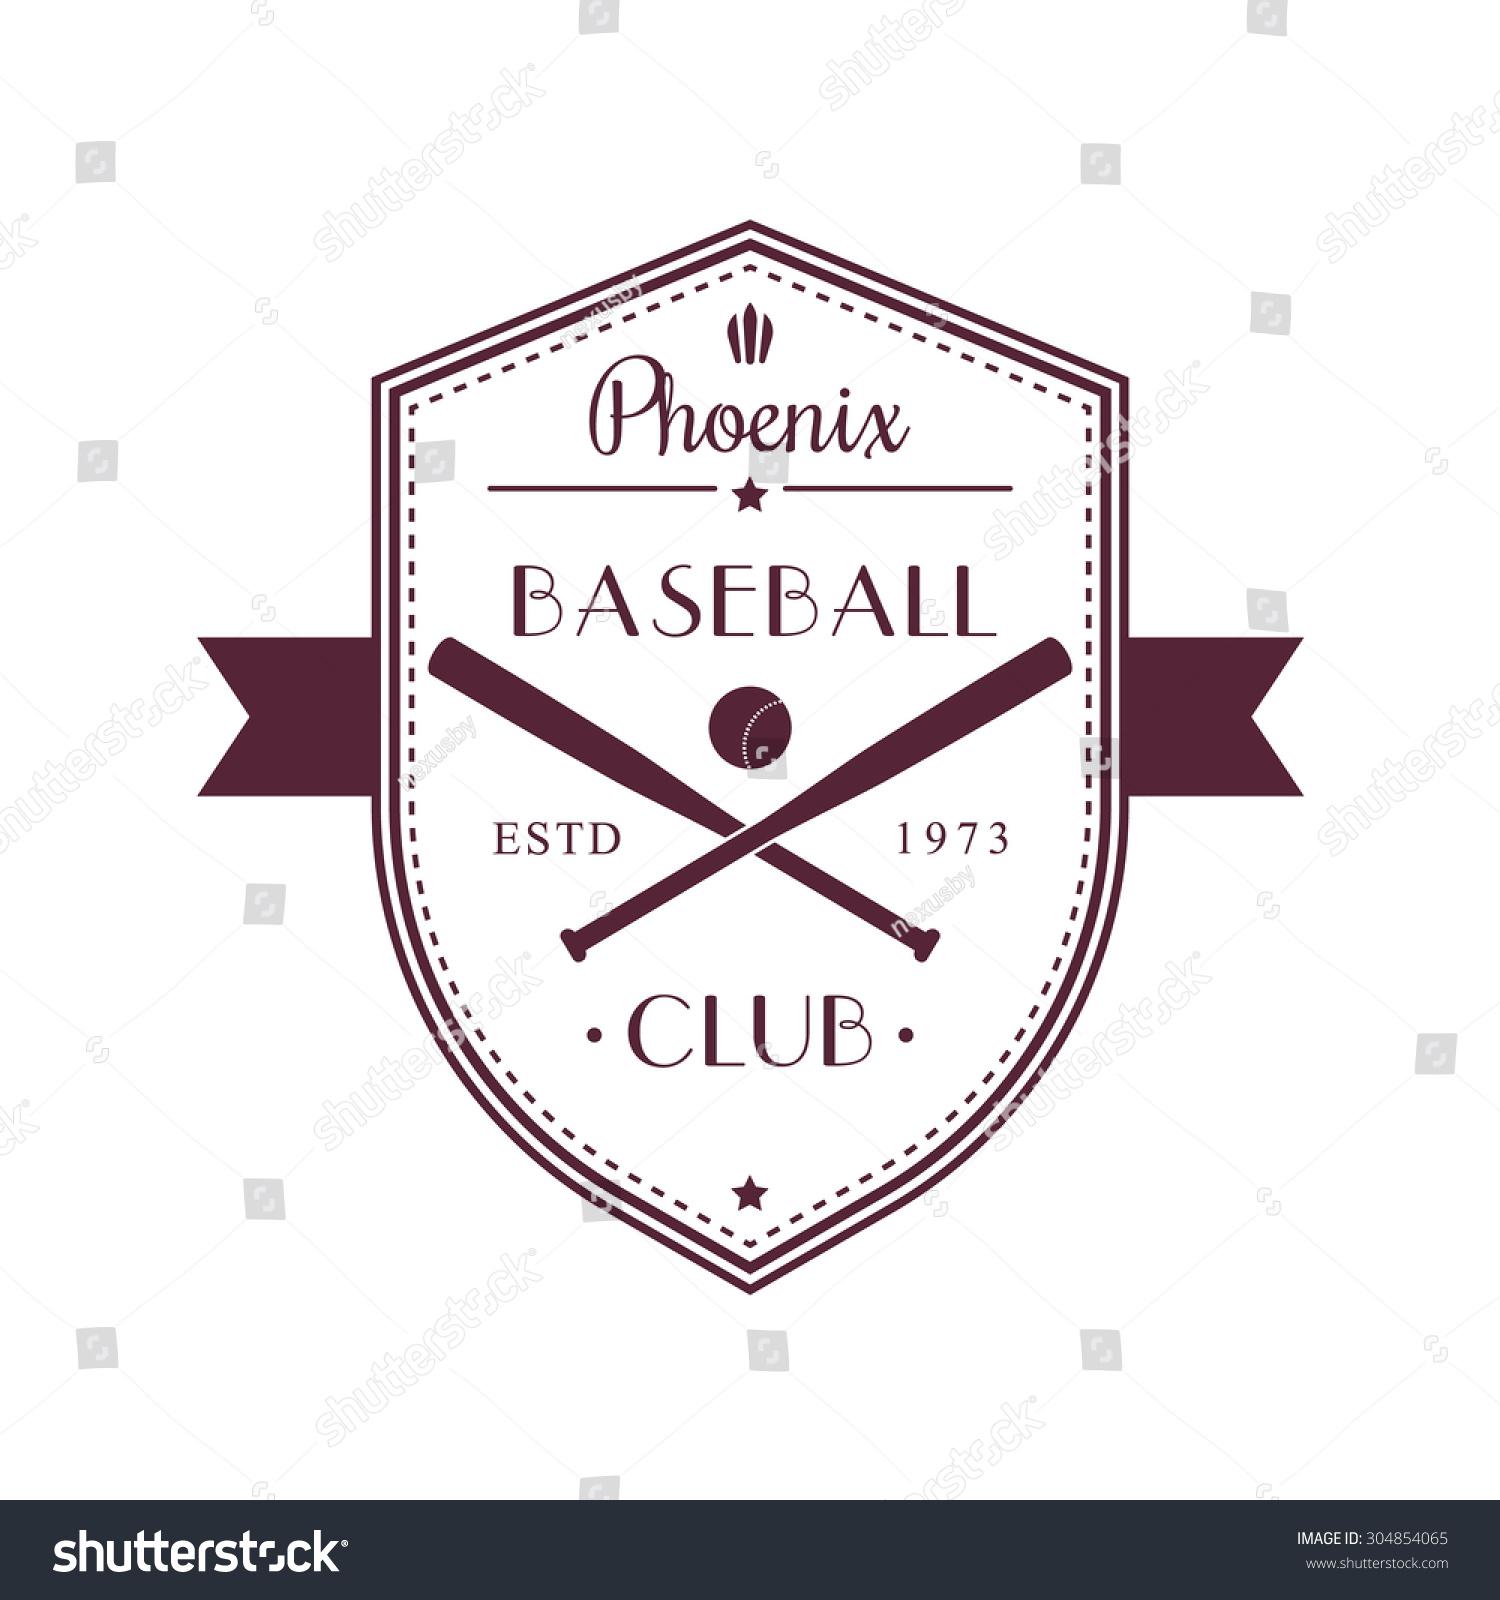 Baseball Vintage Grunge Emblems Logo Tshirt Stock Vector 304854065